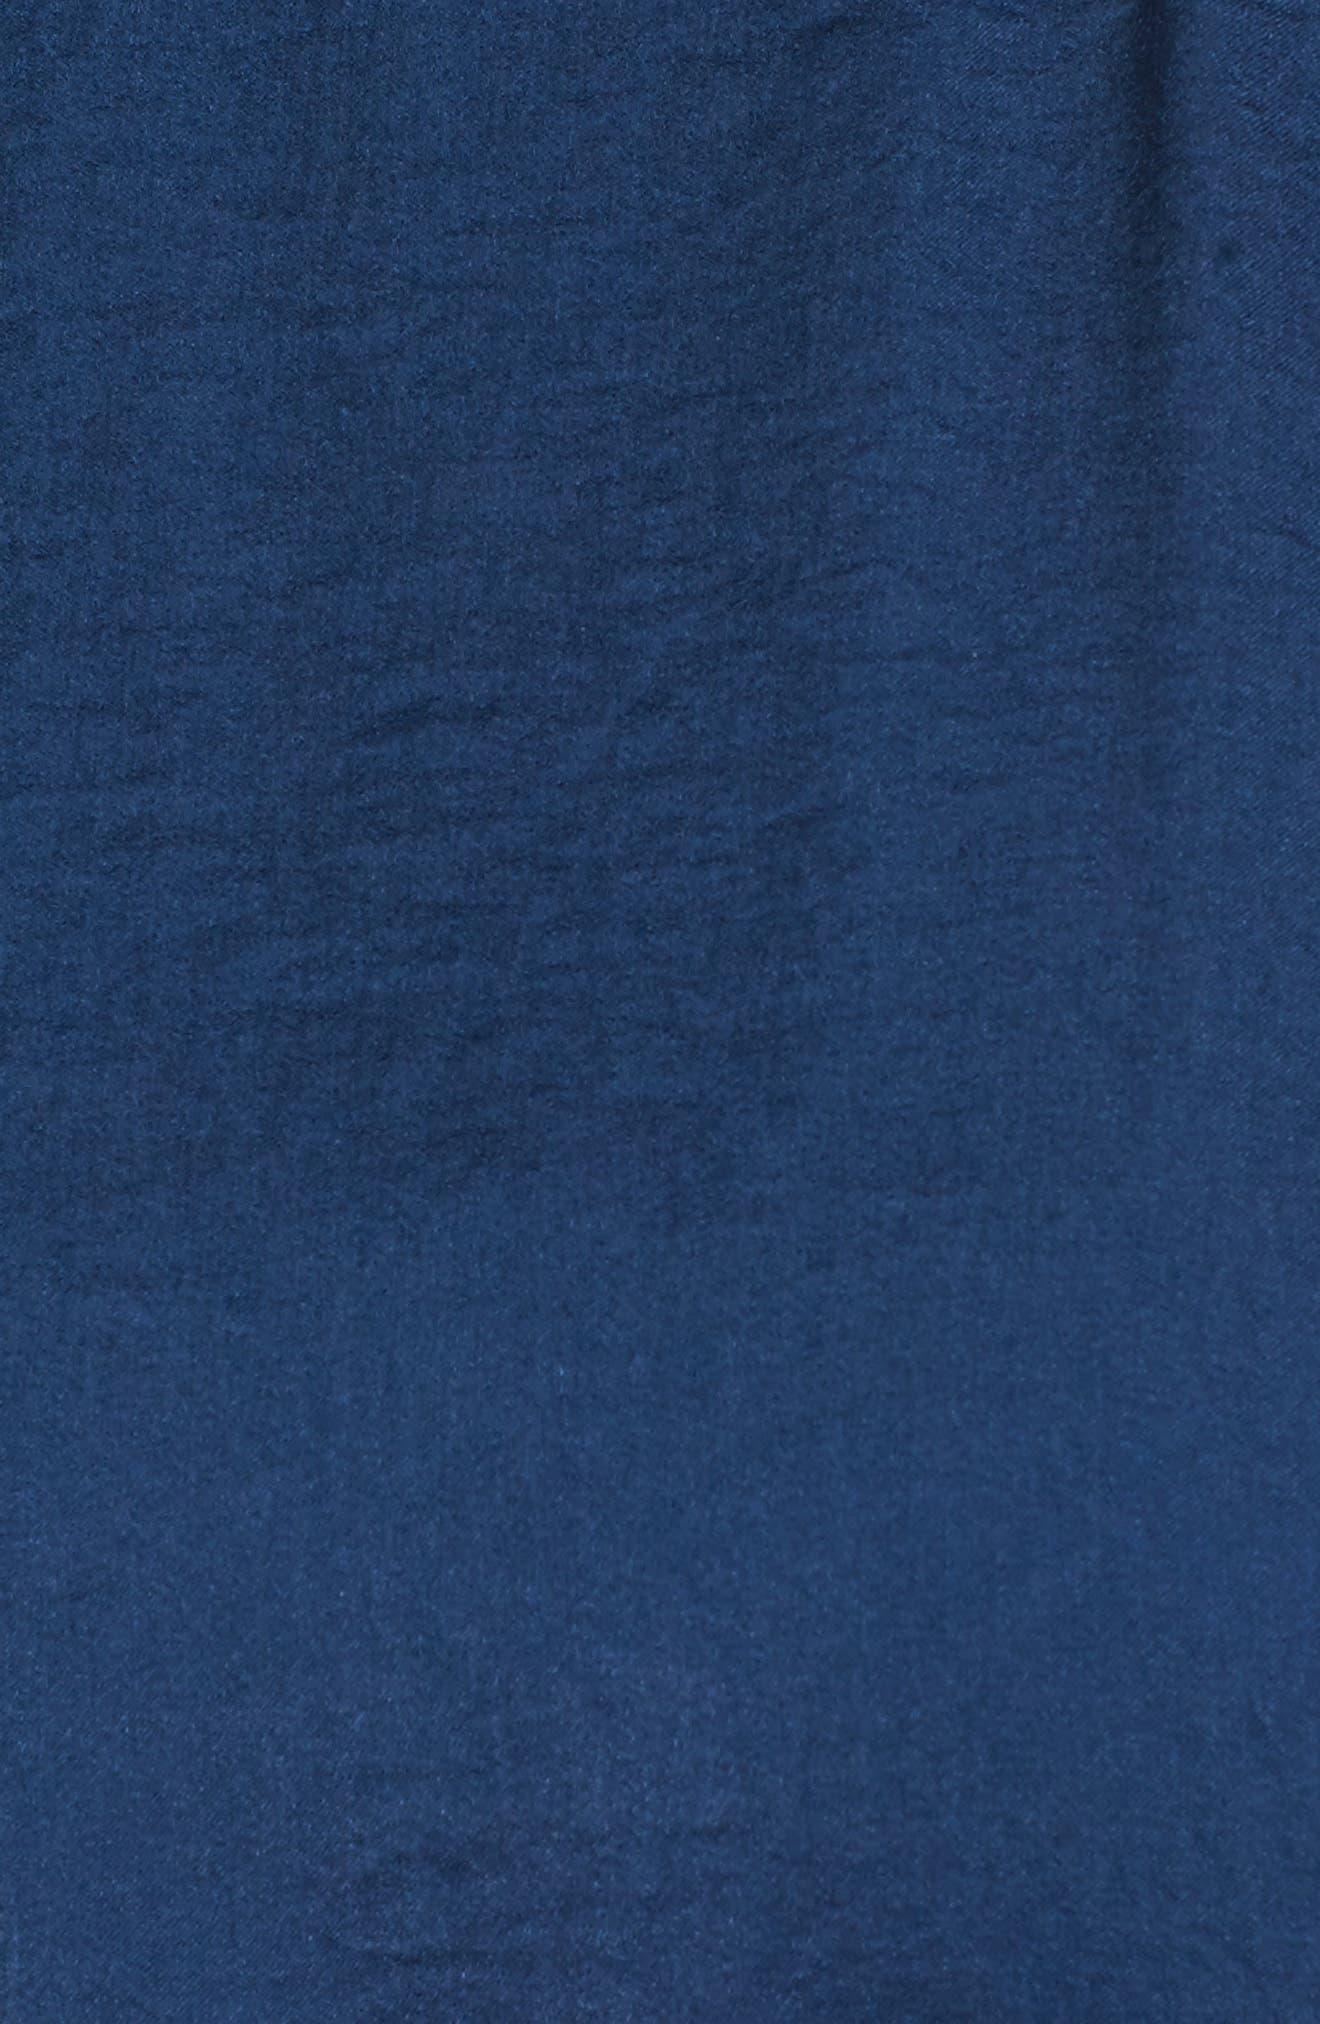 As You Wish Tie Waist Dress,                             Alternate thumbnail 5, color,                             400